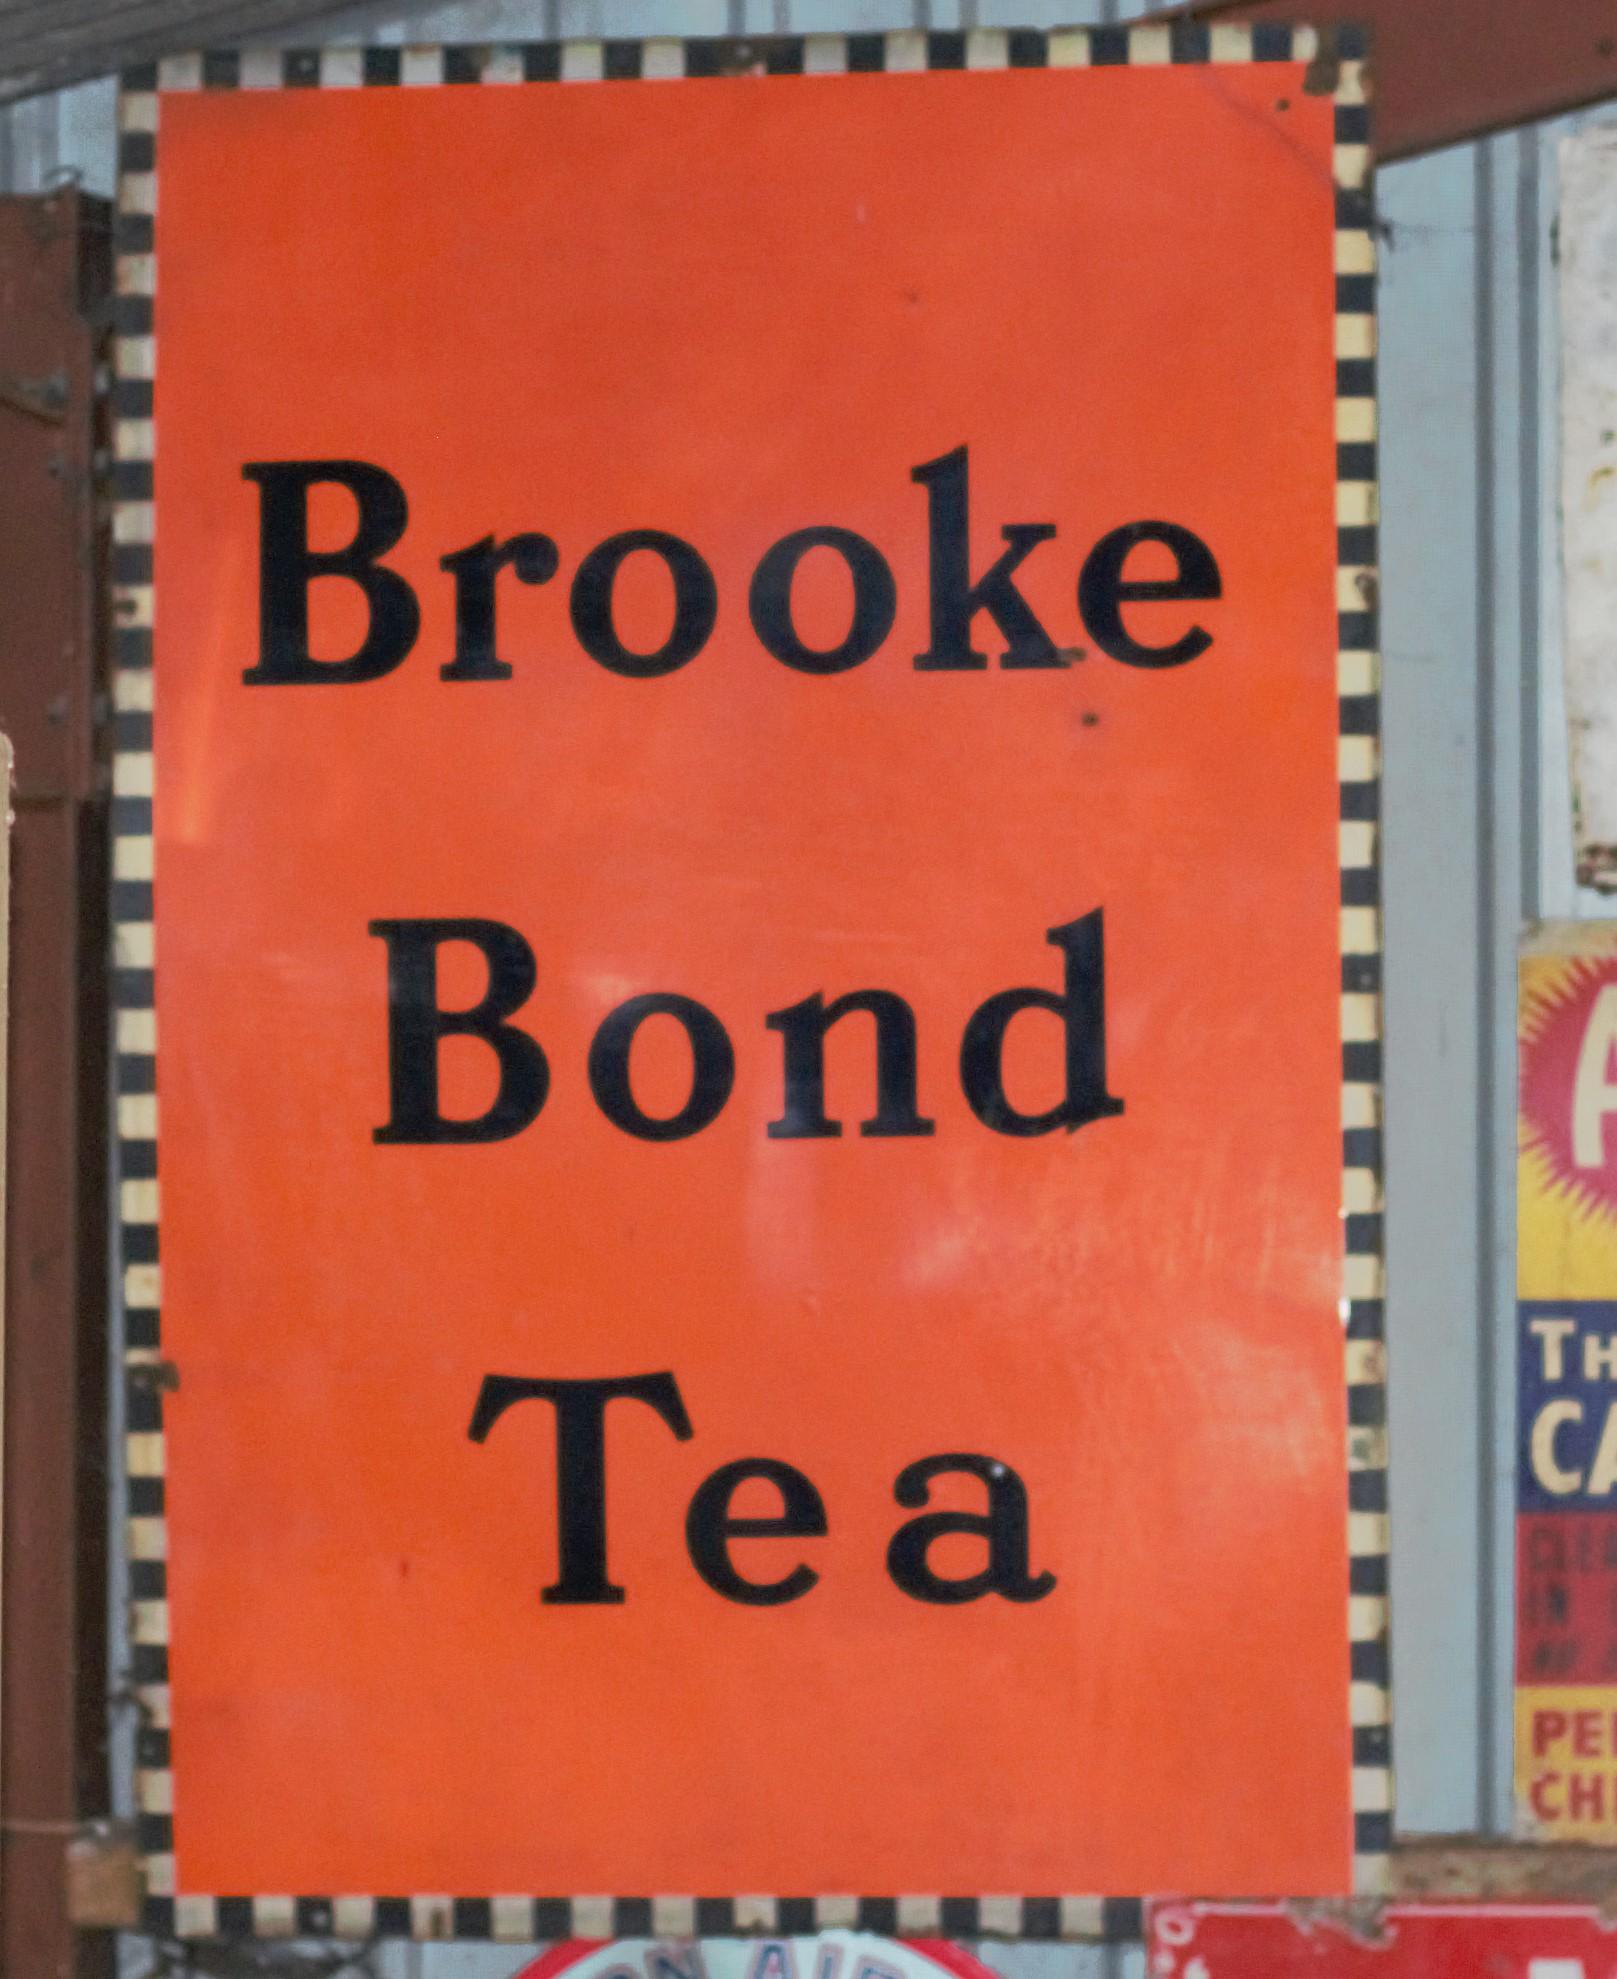 Vintage enamel advertising sign 'Brooke Bond Tea', 101 x 152cm